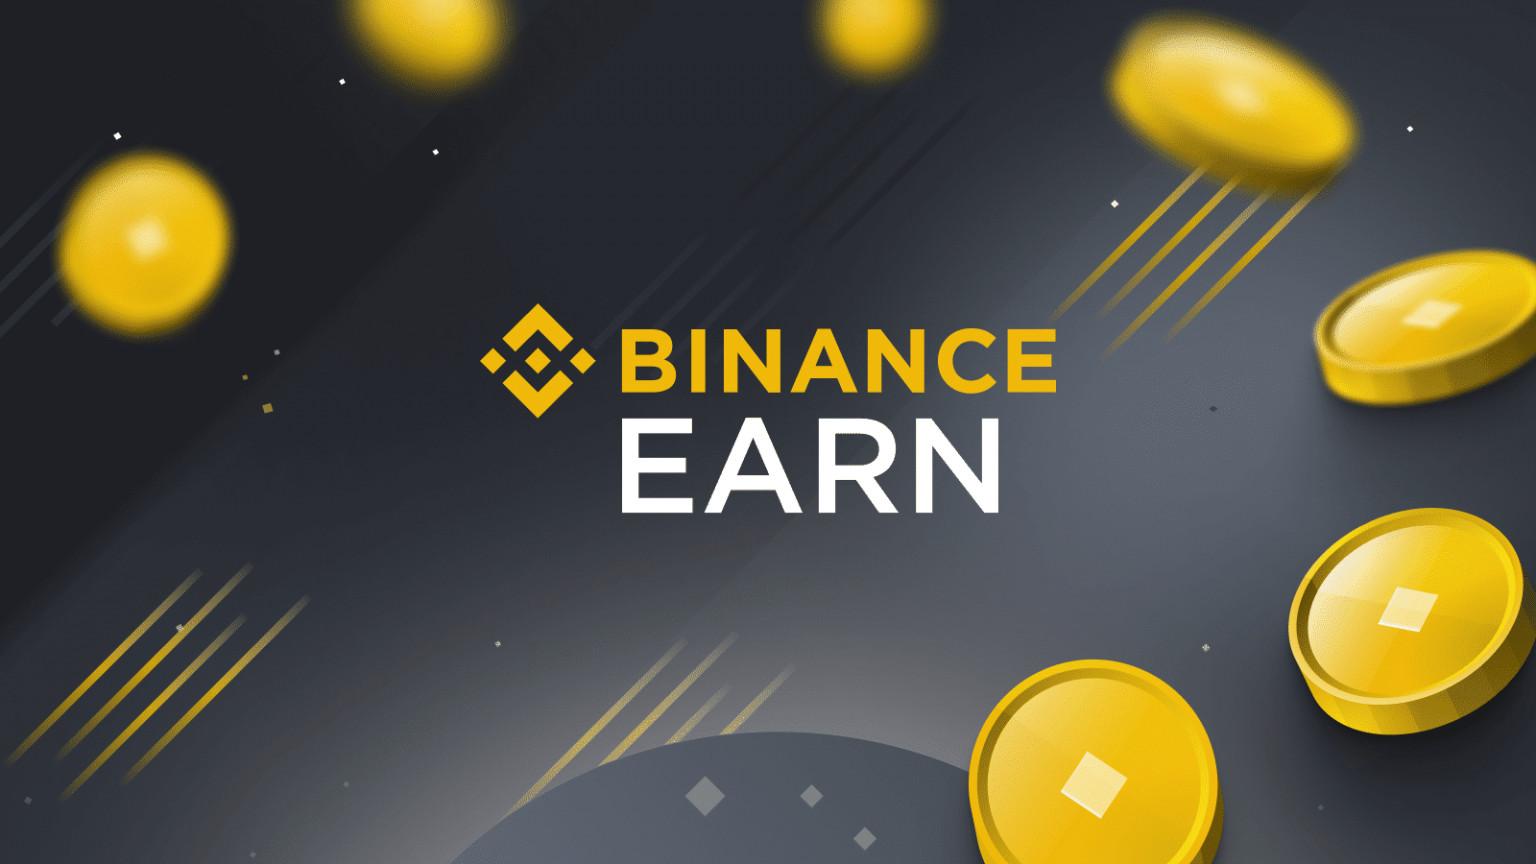 Lending crypto on Binance with Binance Earn